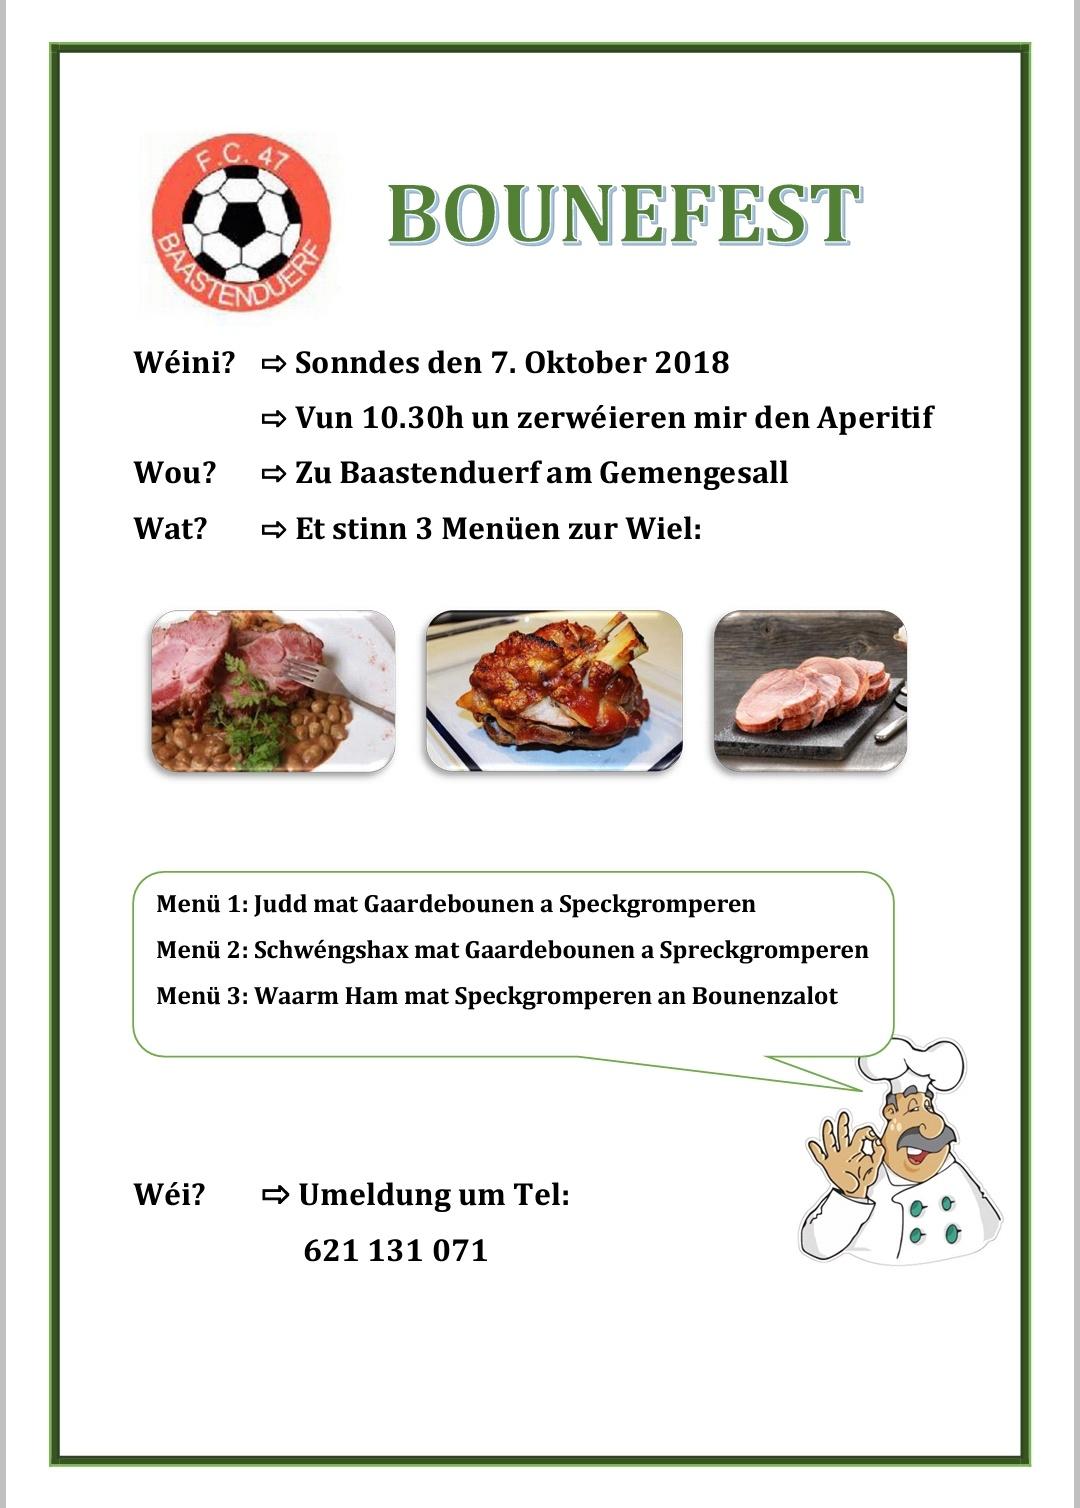 Bounefest